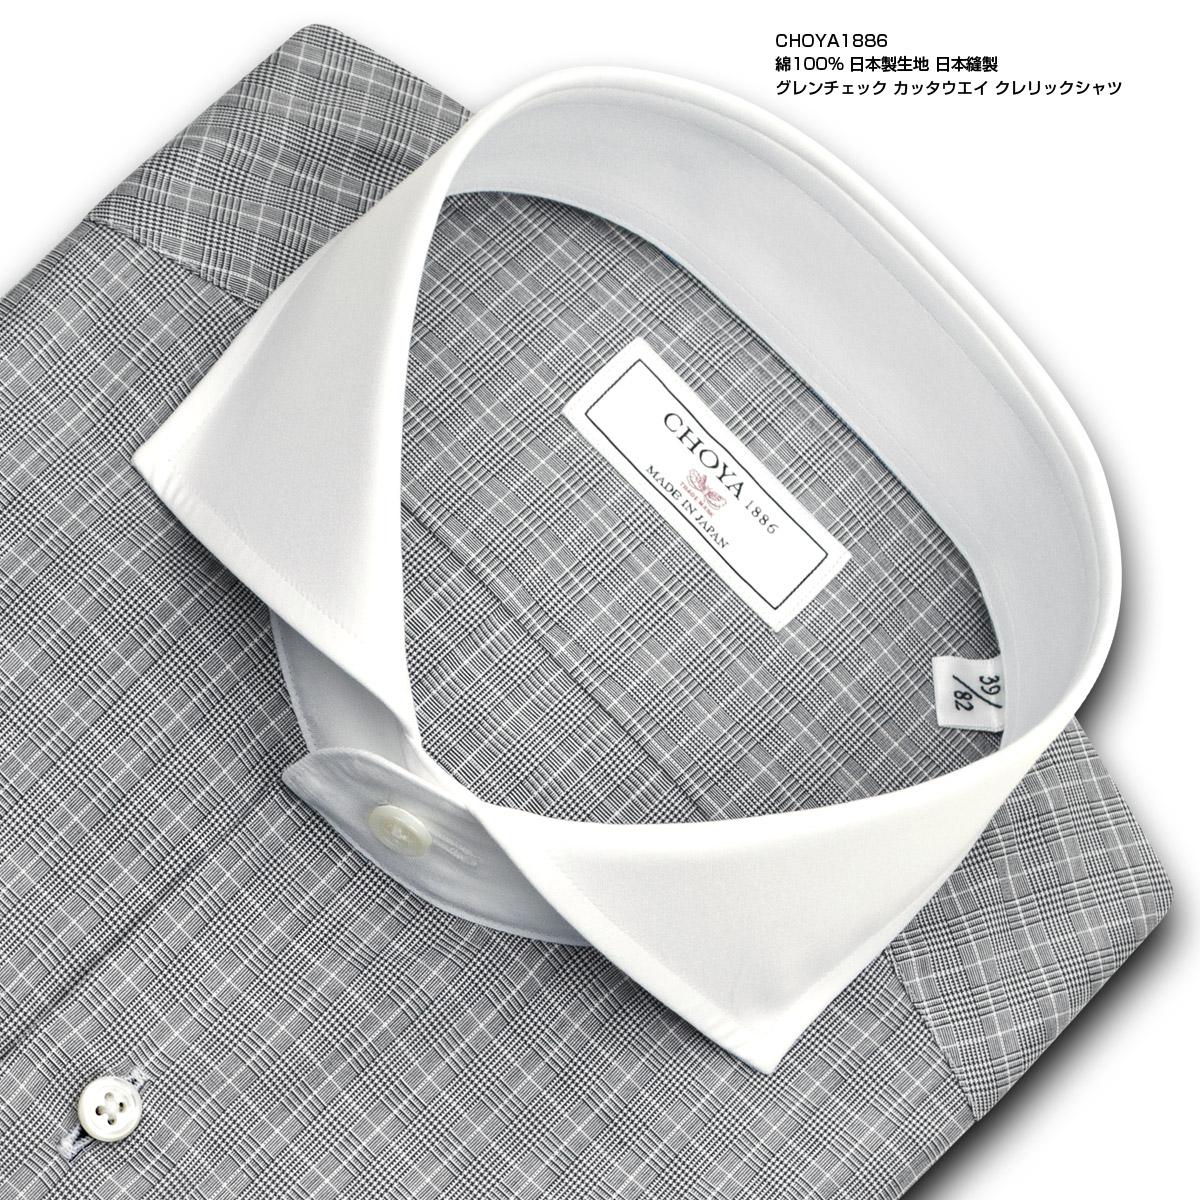 CHOYA 1886 J∞QUALITY認定商品 長袖 ワイシャツ メンズ 春夏秋冬 綿100% 日本製生地 日本縫製 グレンチェック カッタウエイ クレリックシャツ | 綿:100% グレー (cvd803-680)